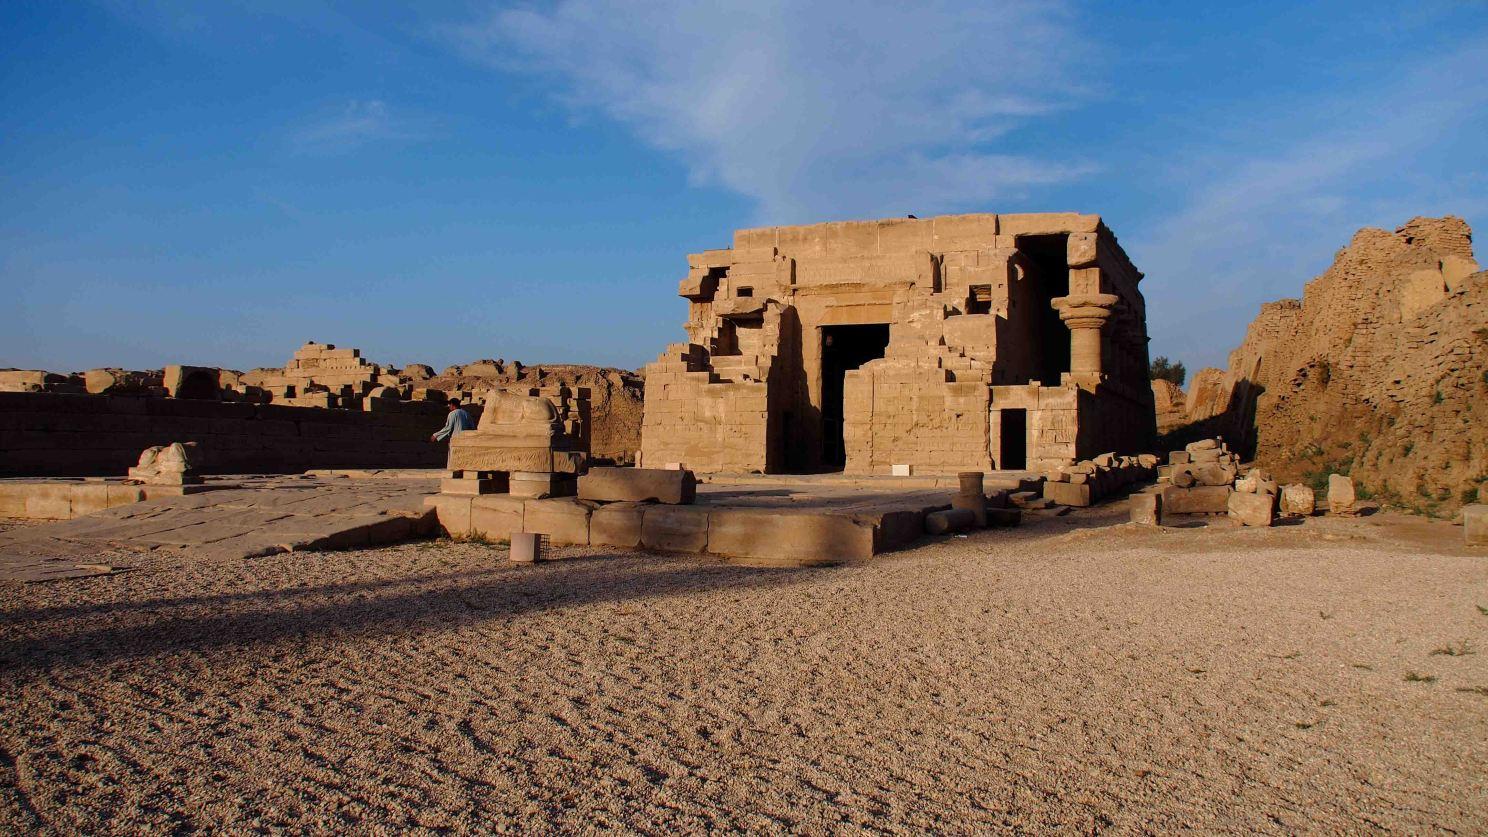 casa-nacimiento-romana-templo-dendera